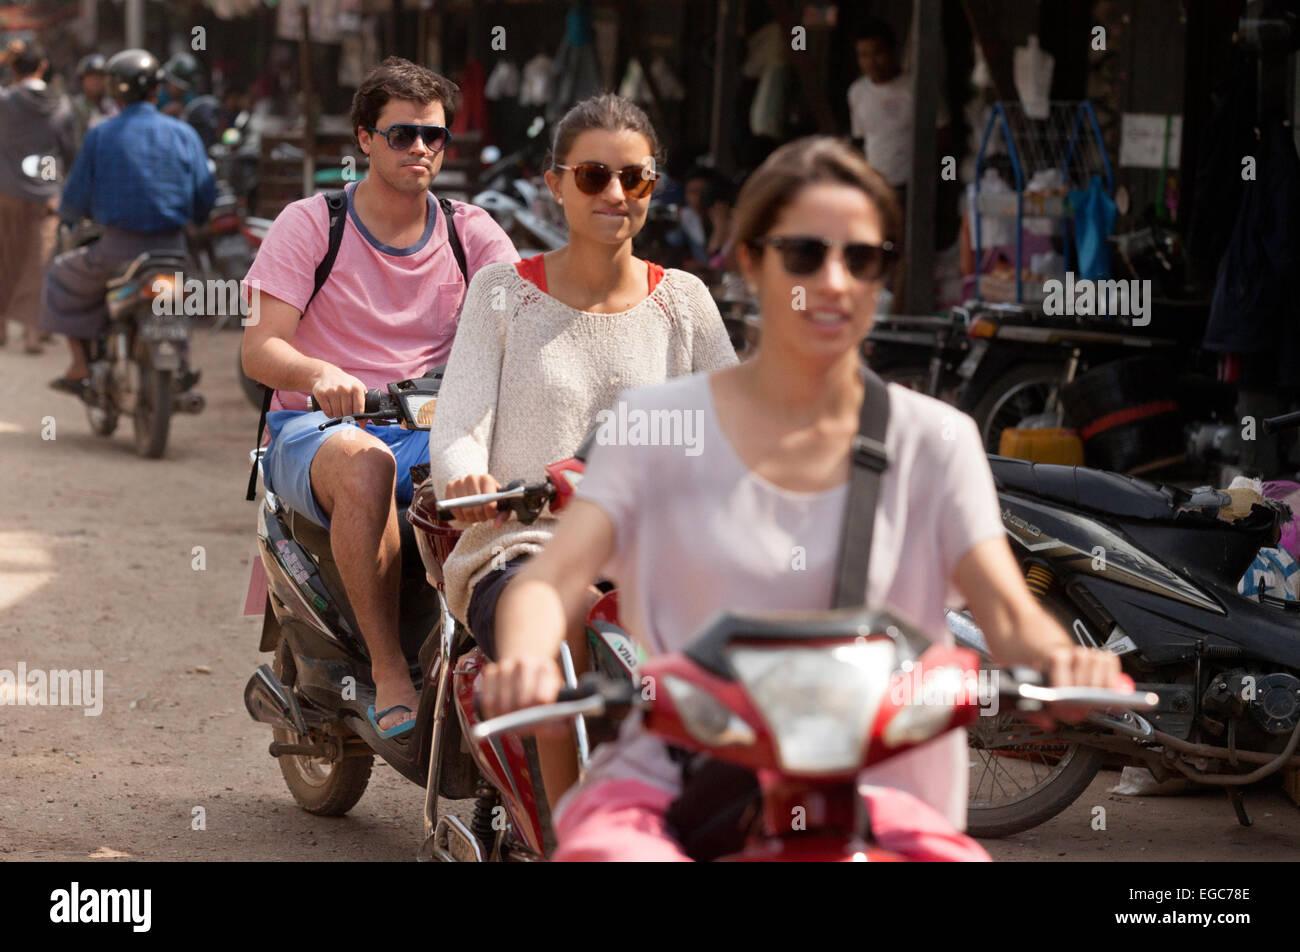 Three western tourists riding motorbikes, Bagan, Myanmar ( burma ), Asia - Stock Image